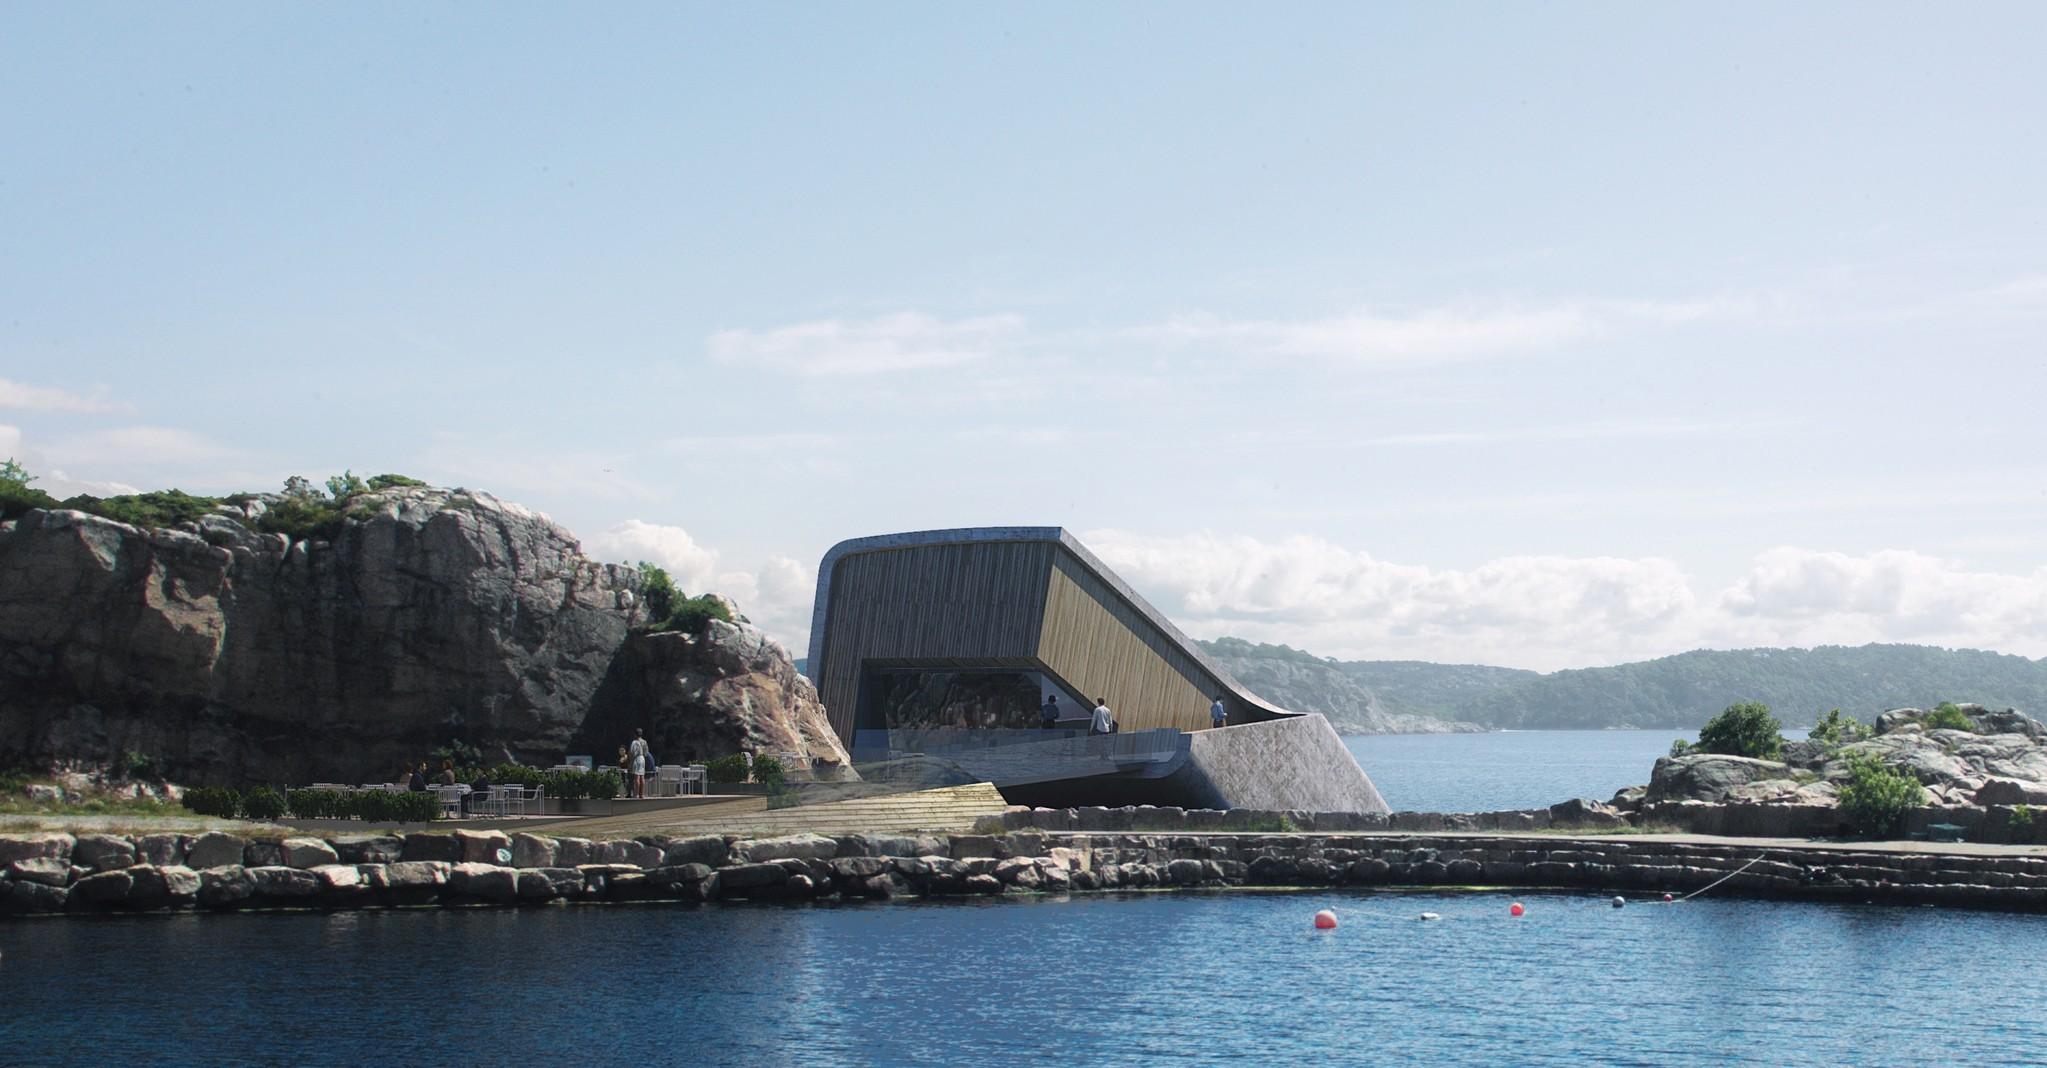 Snøhetta crean el primer restaurante submarino de Europa